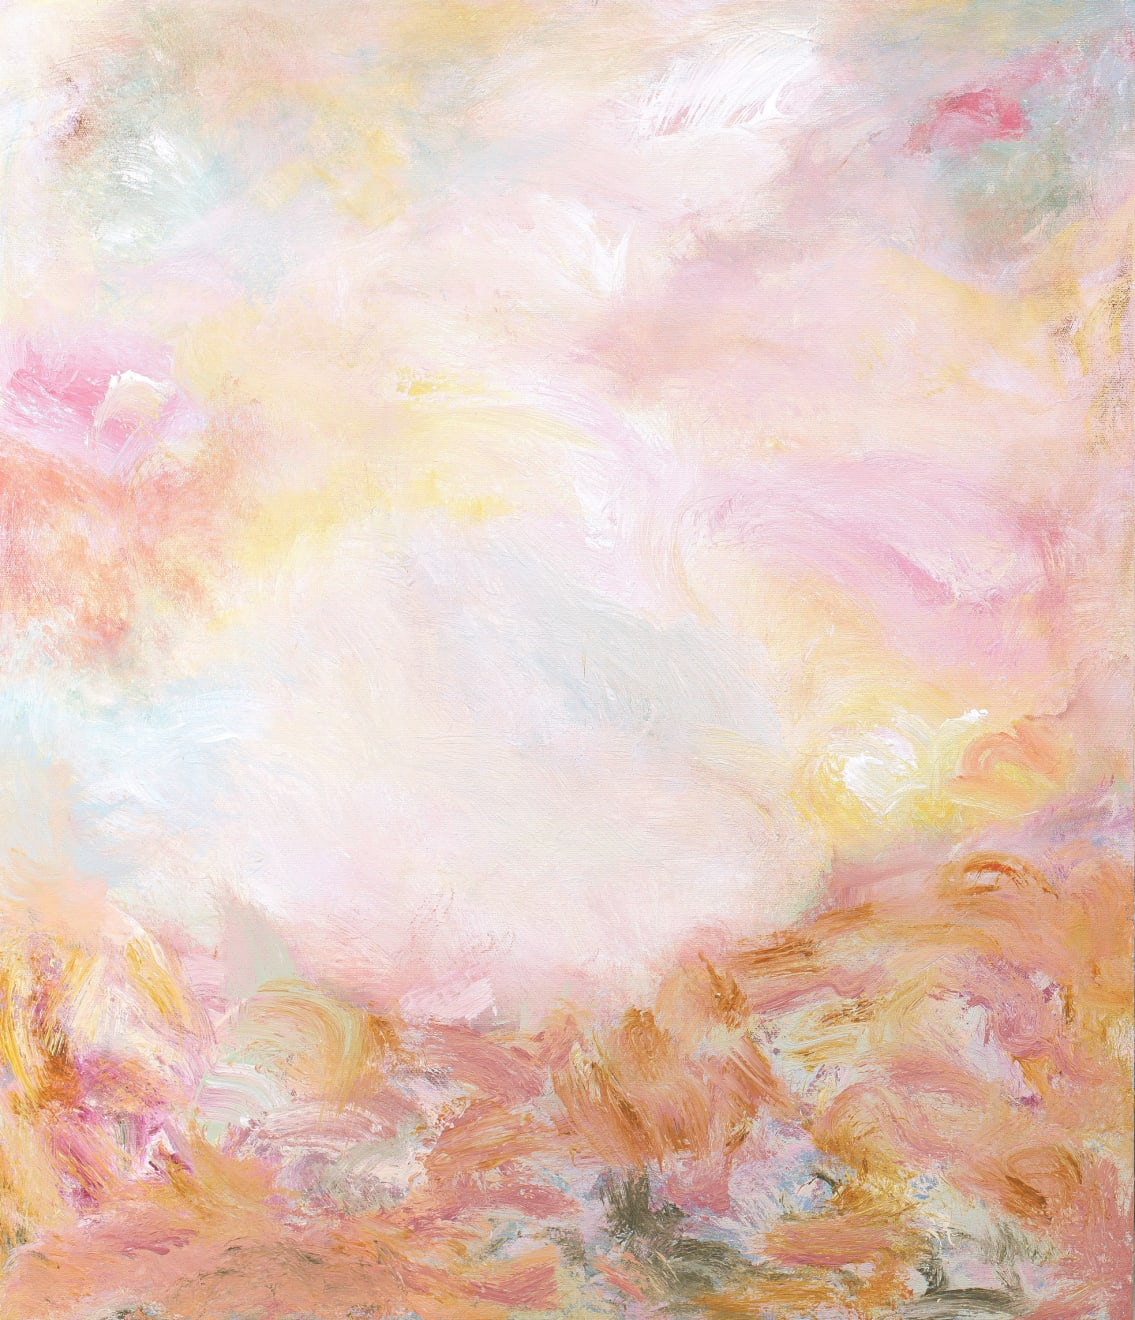 Patricia Qualls, Healing Spring, 2020